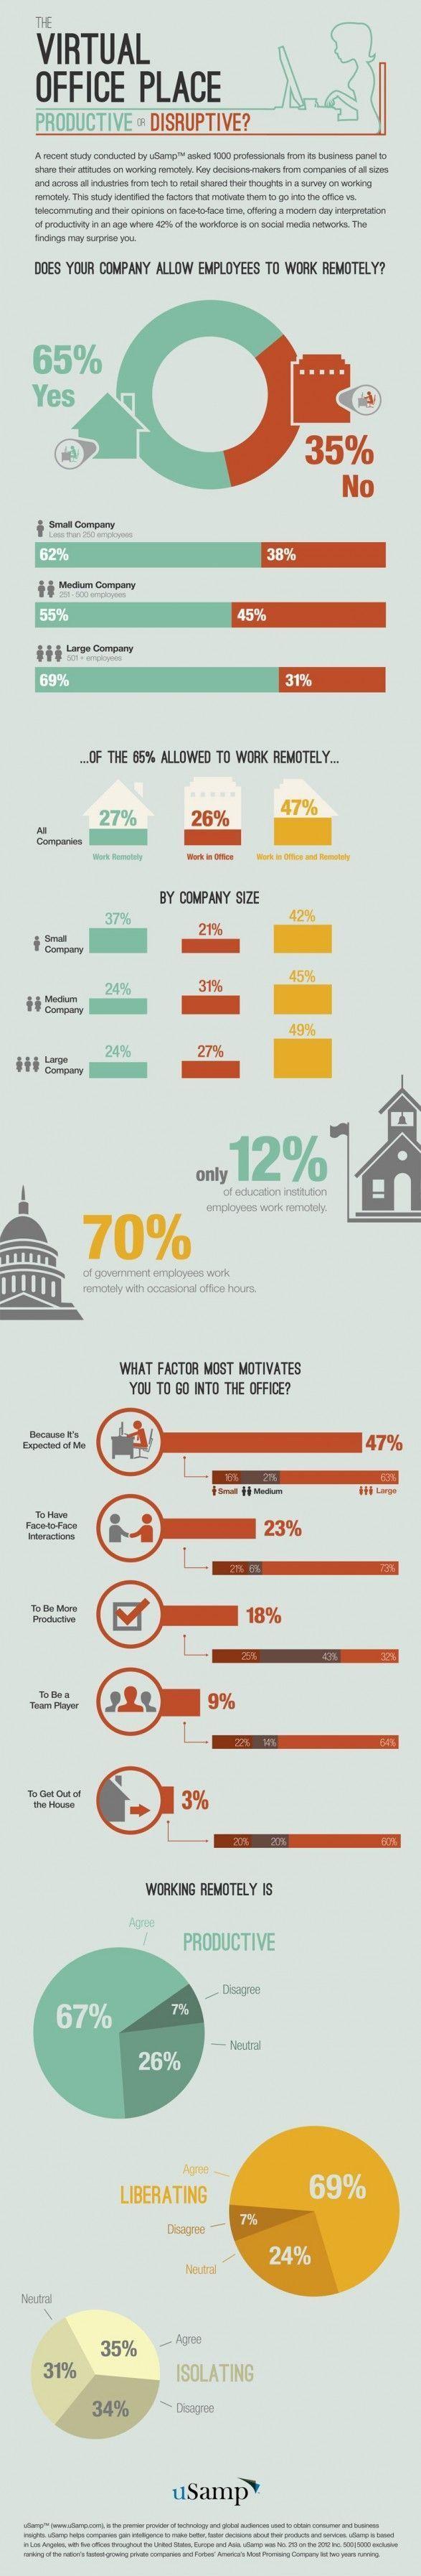 Teletrabajo: ¿Productivo o disruptivo? #infografia #infographic